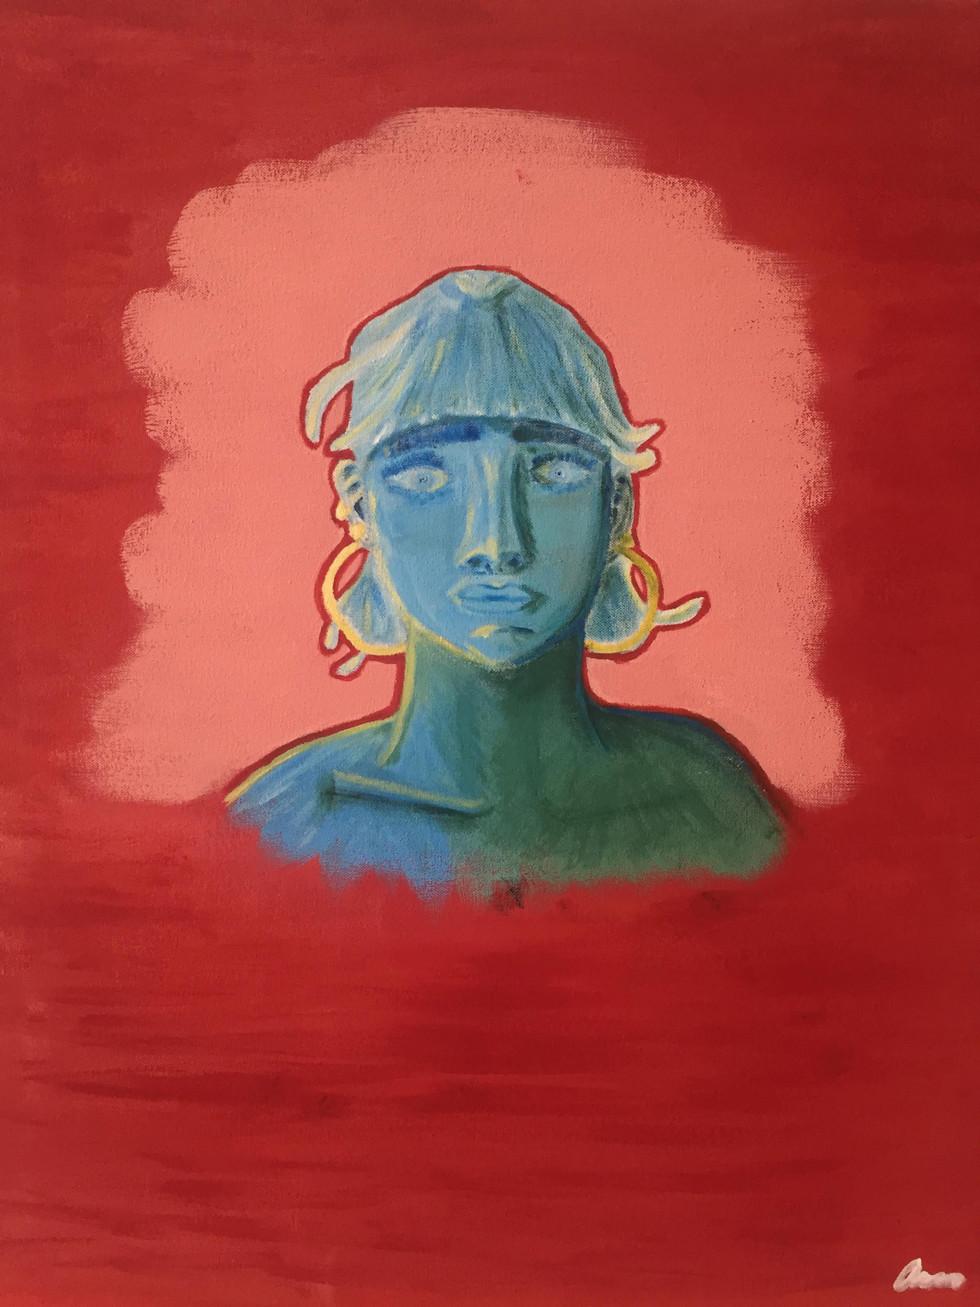 Self Portrait in Paint (2019)